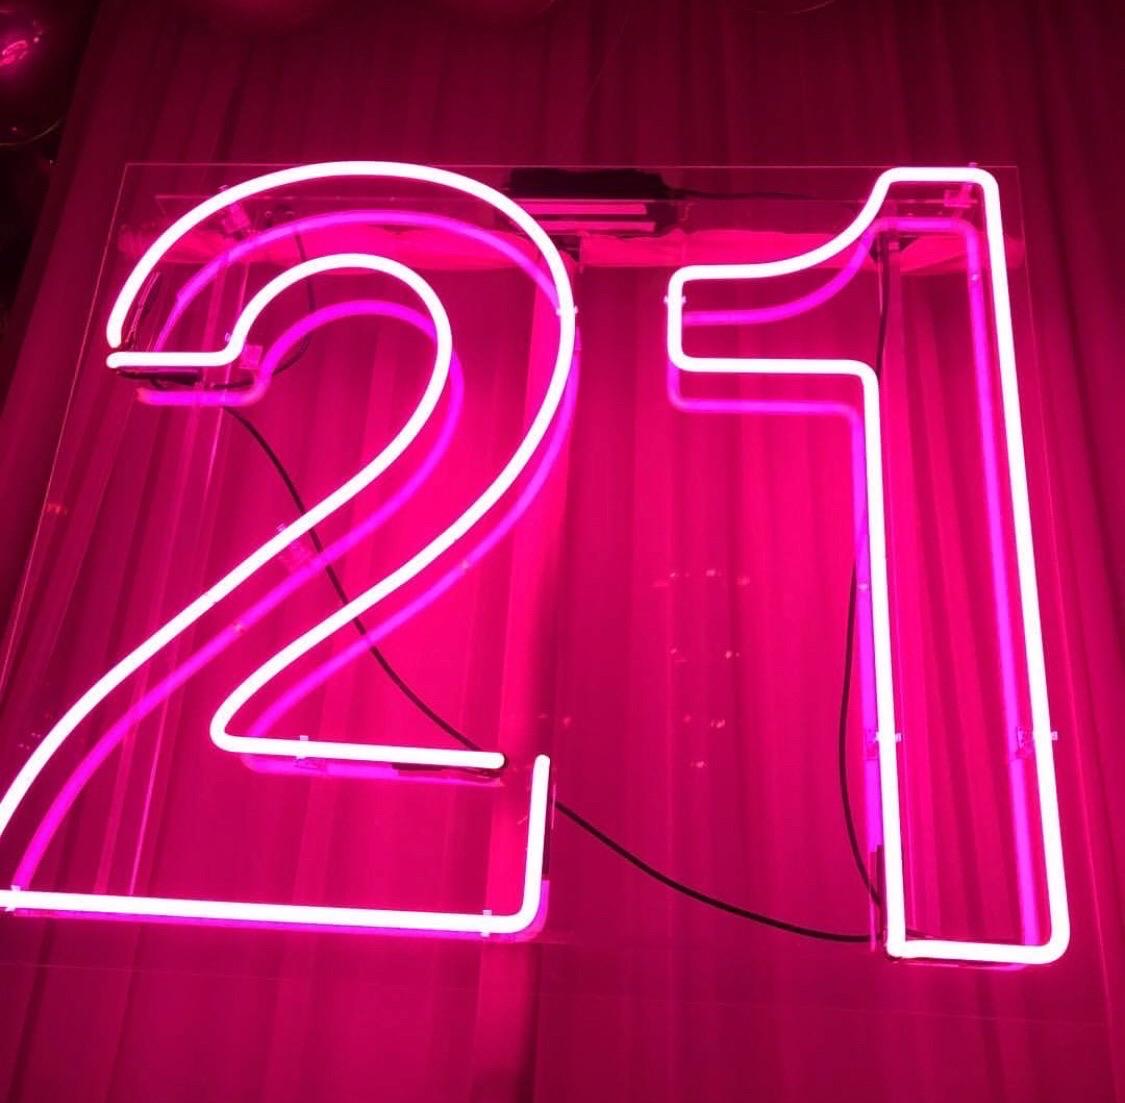 birthday, love, and 21 image